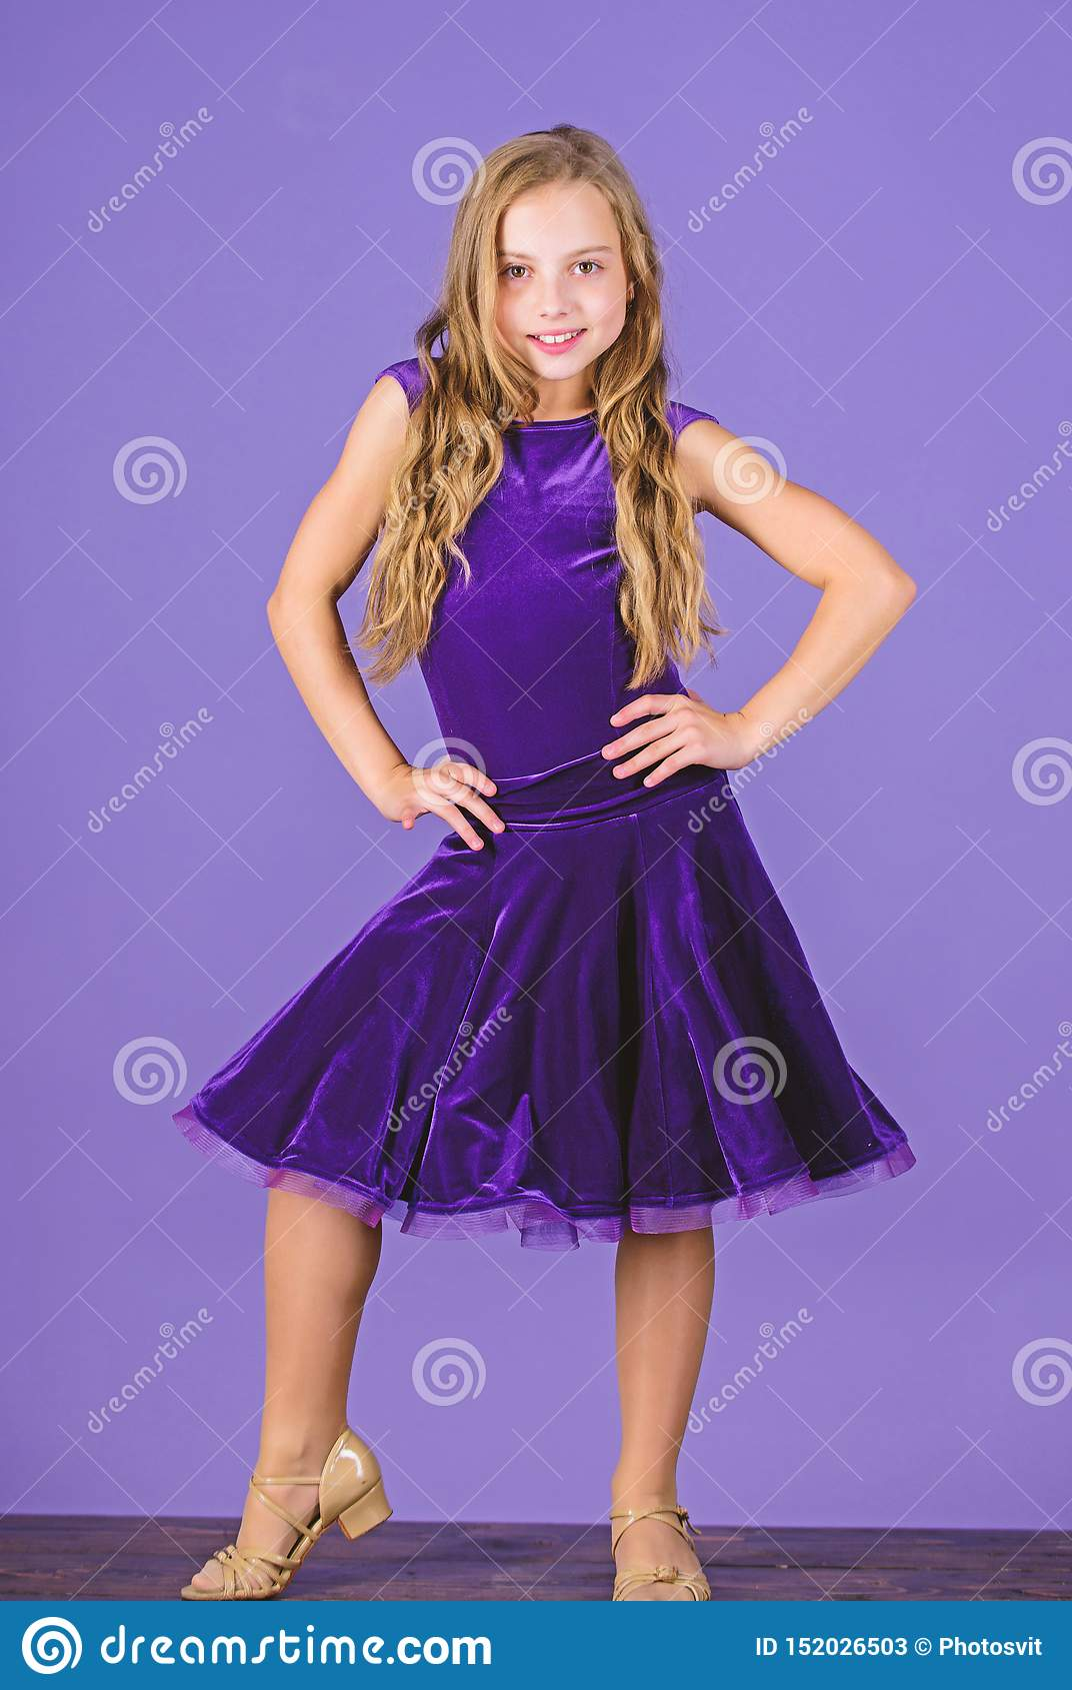 Ballroom fashion. Girl child wear velvet violet dress. Clothes for ballroom dance. Kid fashionable dress looks adorable